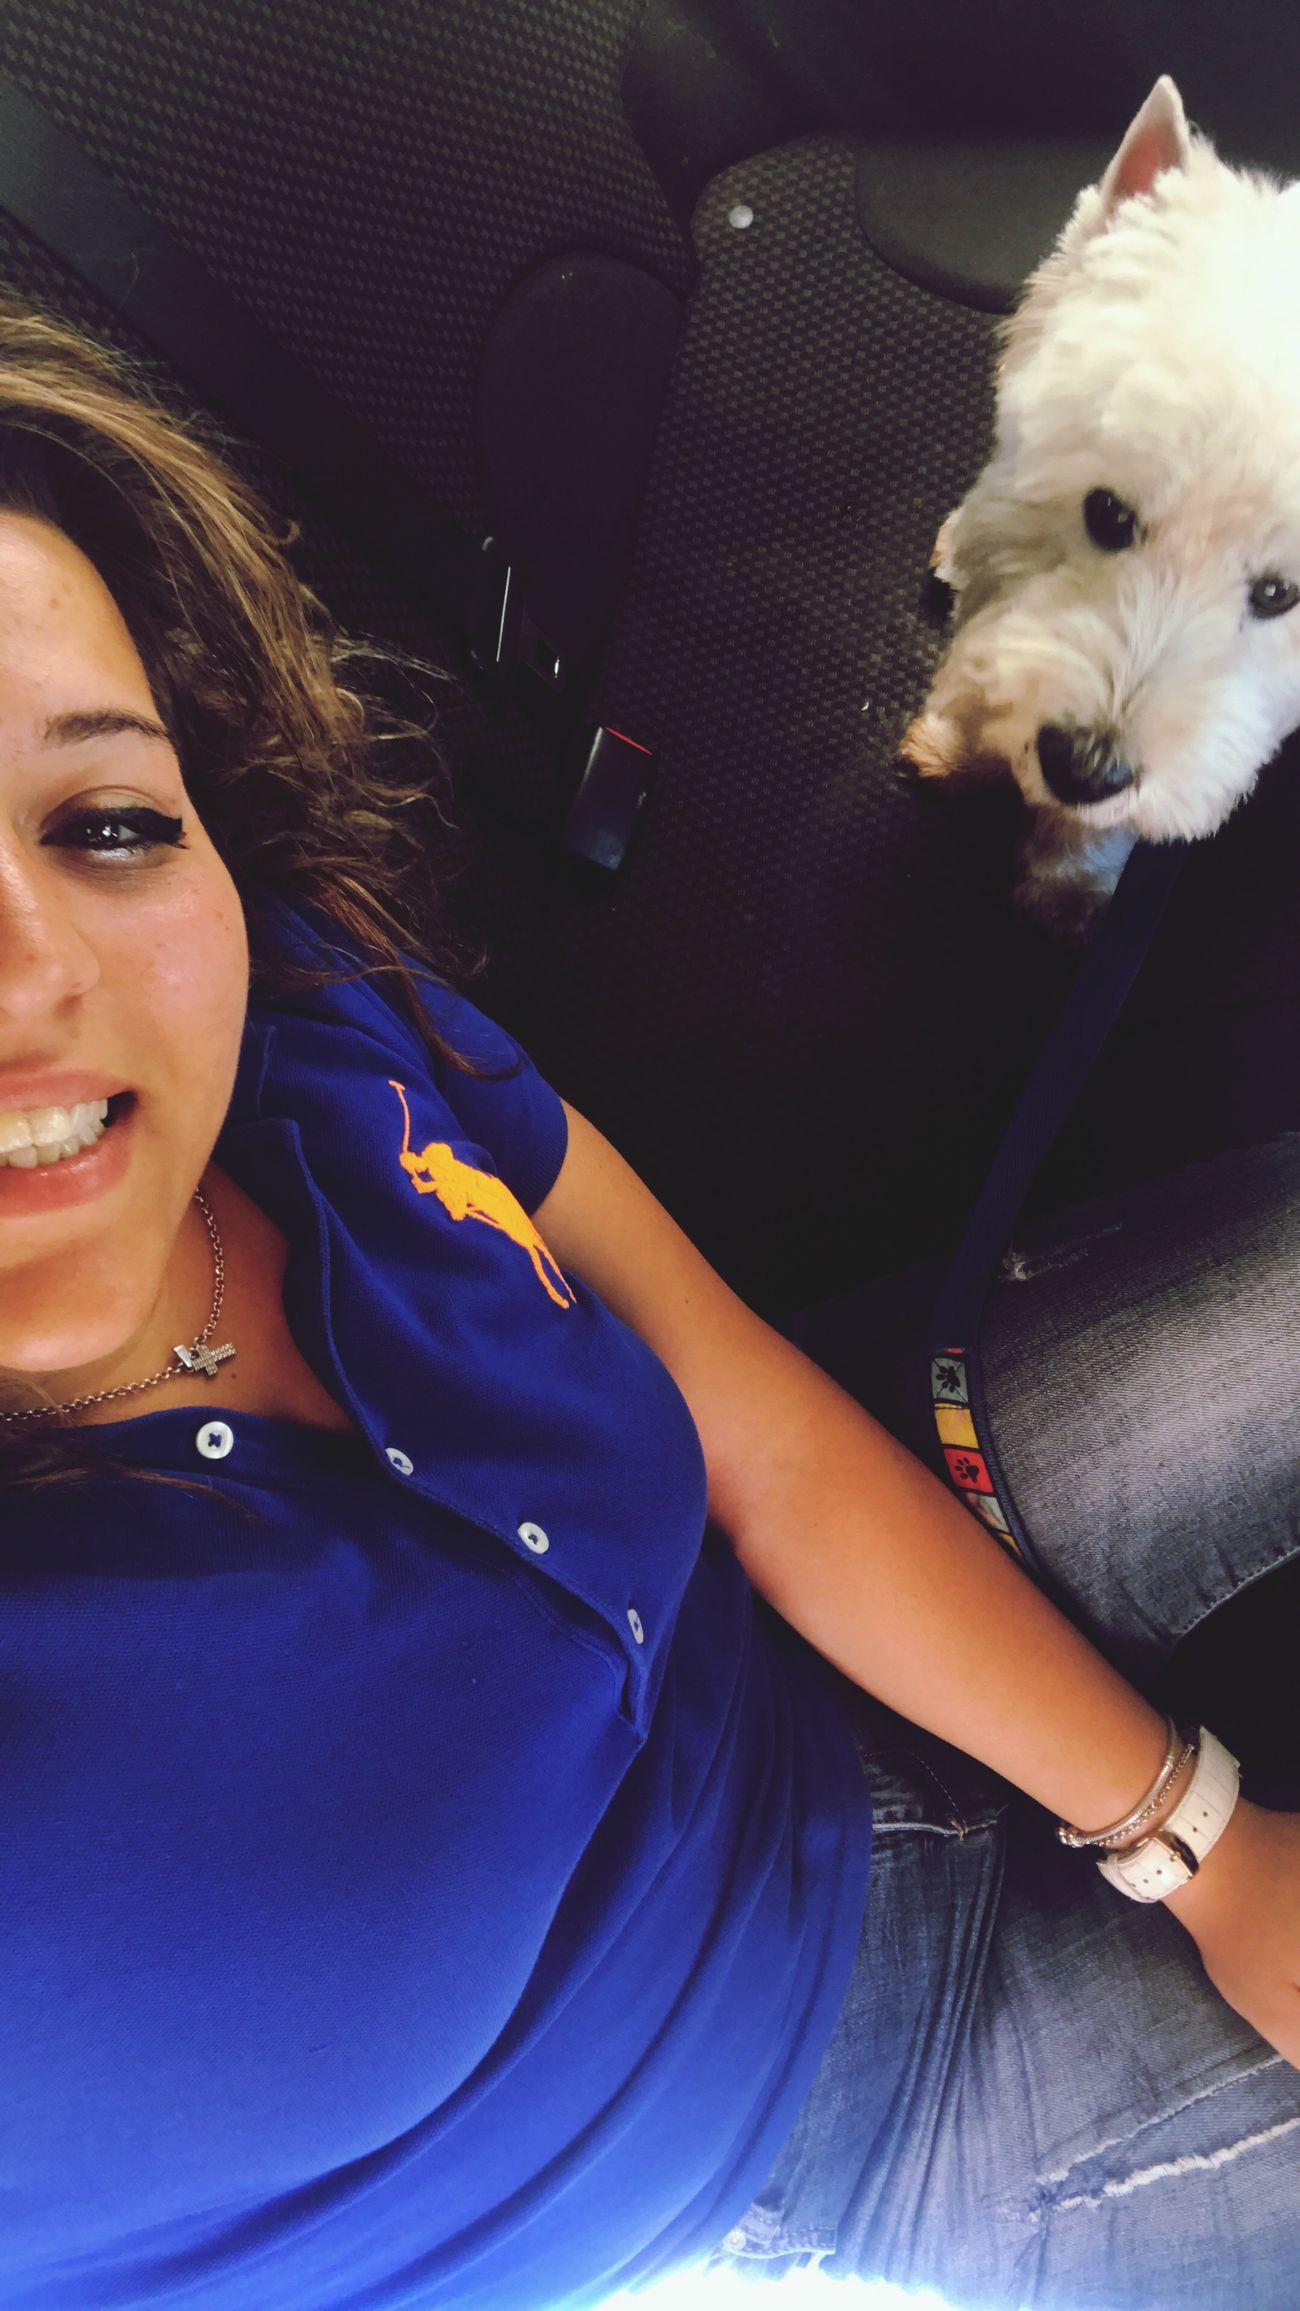 😘❤️ Smile OcchiettiBelli Me Girl Goodmorning World  Napoletana❤️ Goodmorning EyeEm  Woman Sole...☀ Buenas Días!  Soleil☀️ Beautiful ♥ Instafollow Istacoment Smile❤ Mydog♡ Dogstagram Dog Photography Dog Love Happy